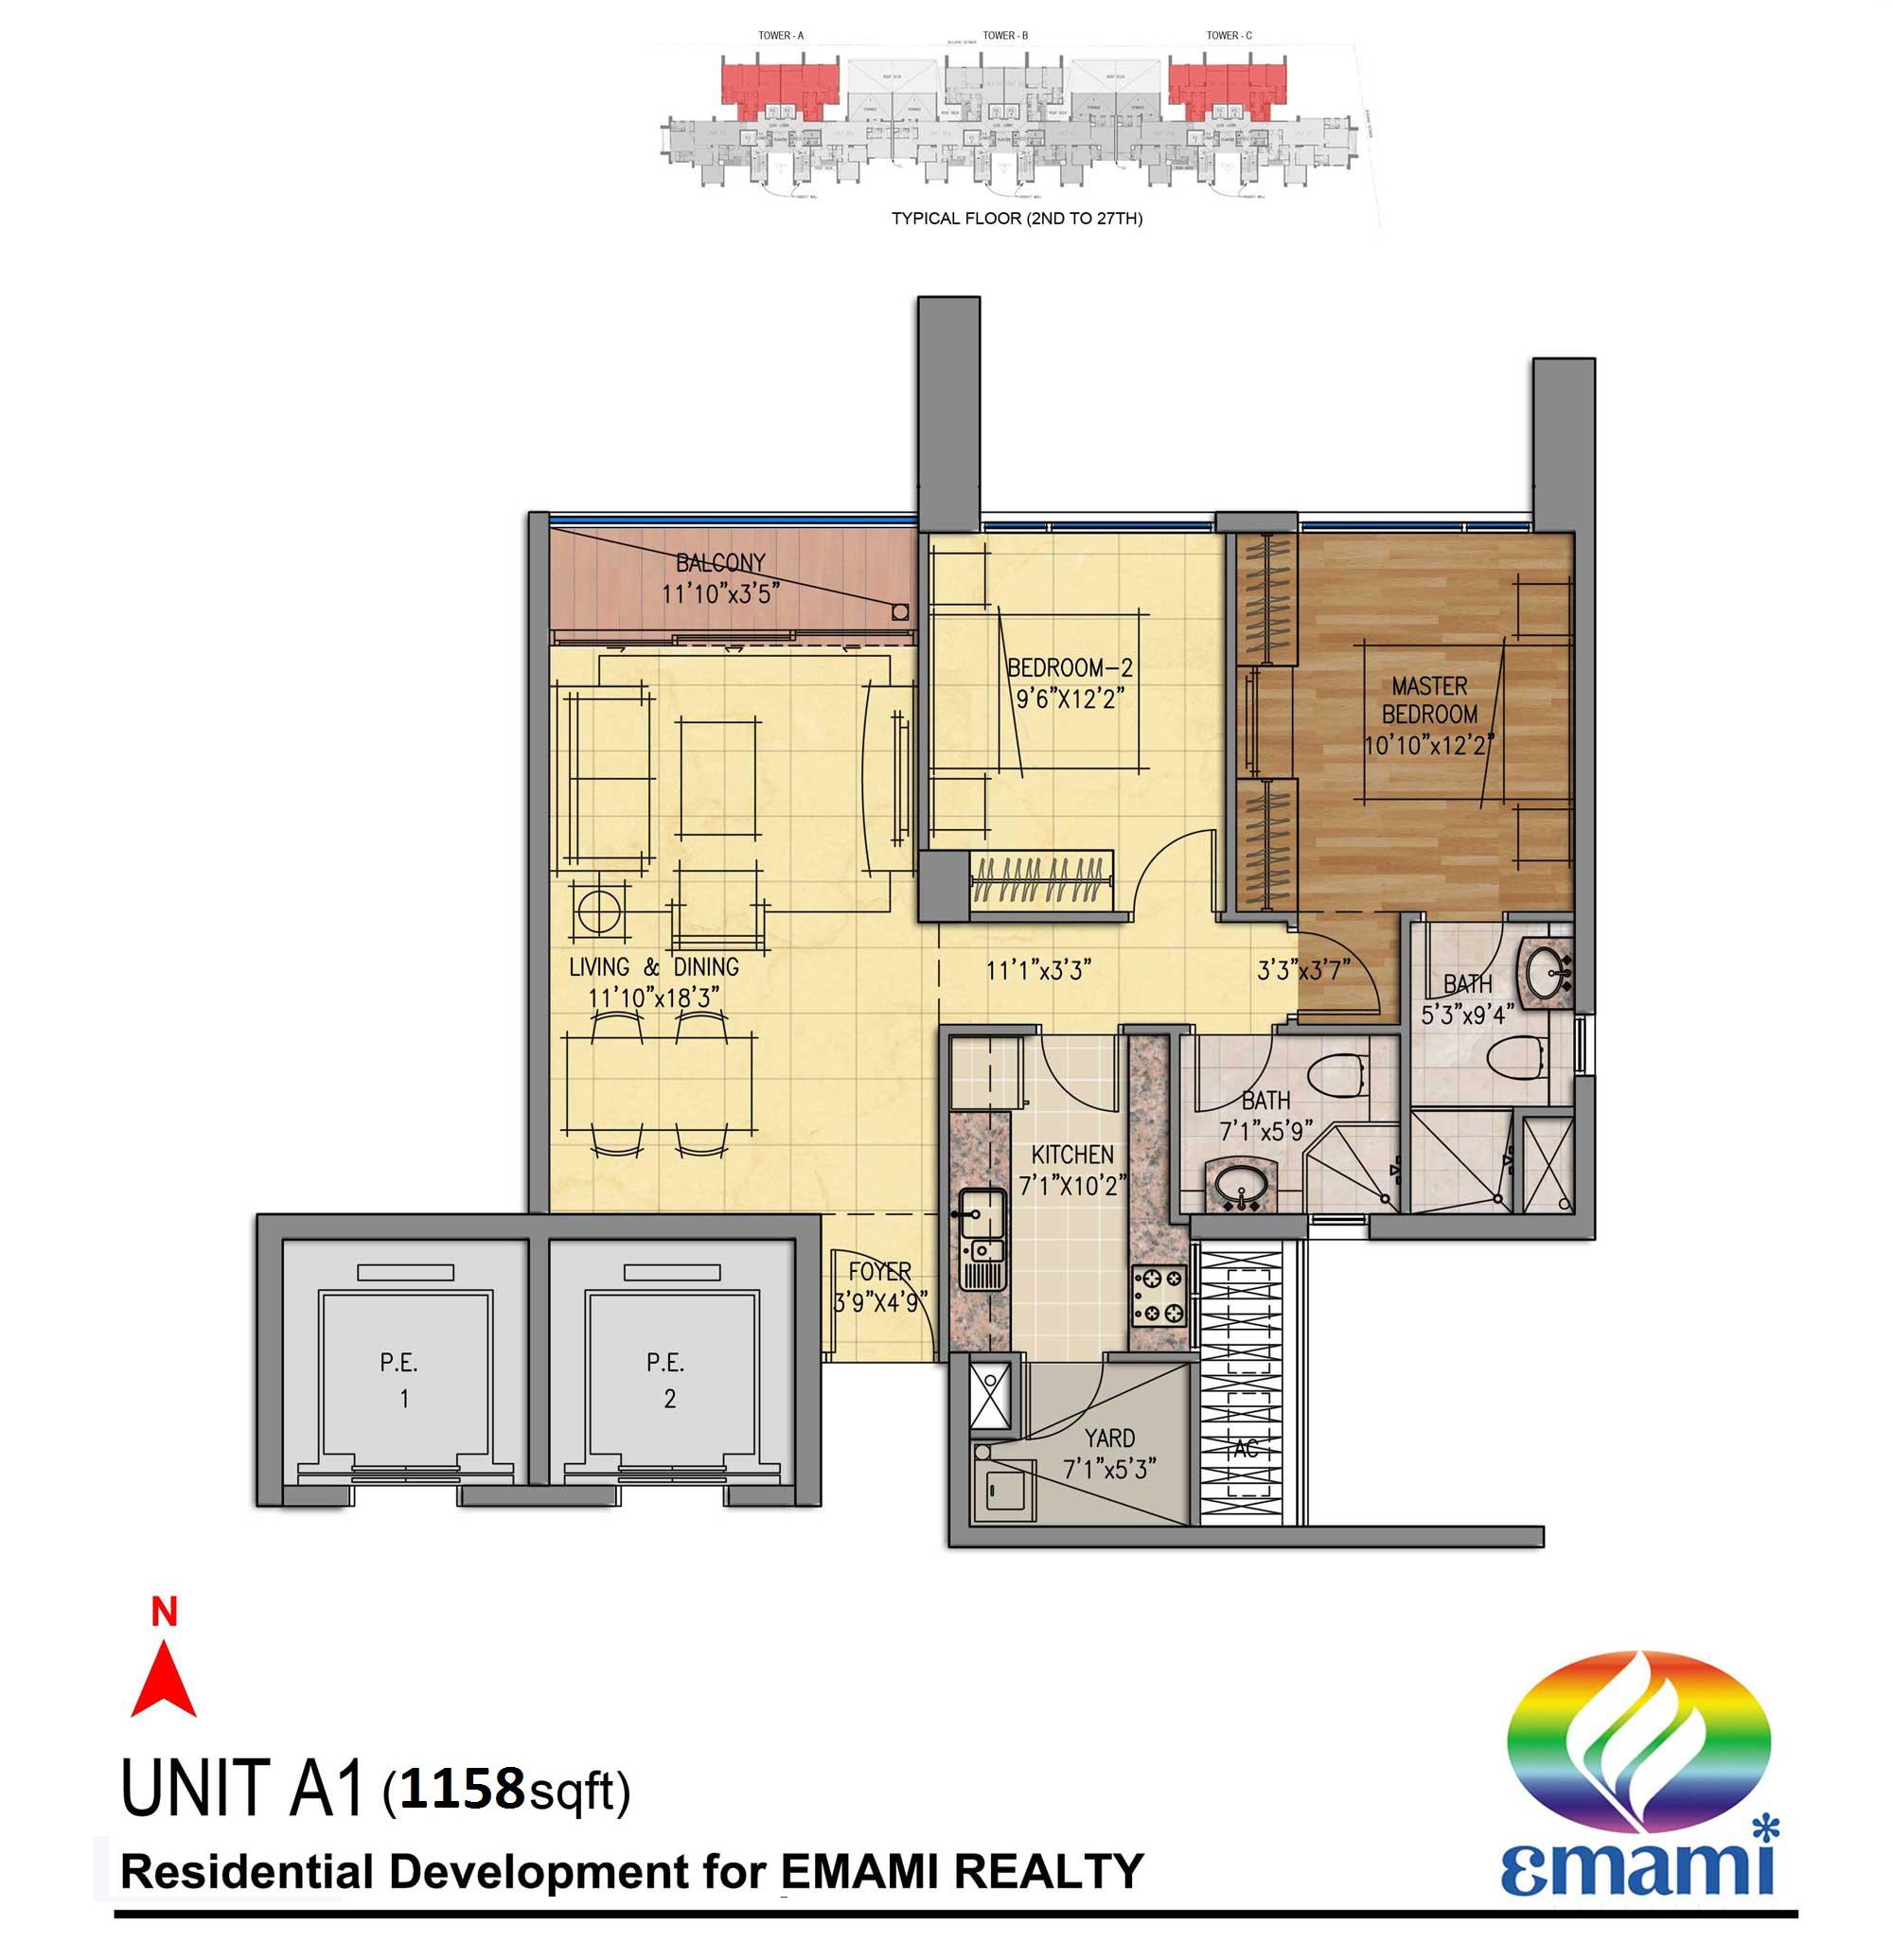 emami tejomaya apartment 2bhk 1158sqft 1